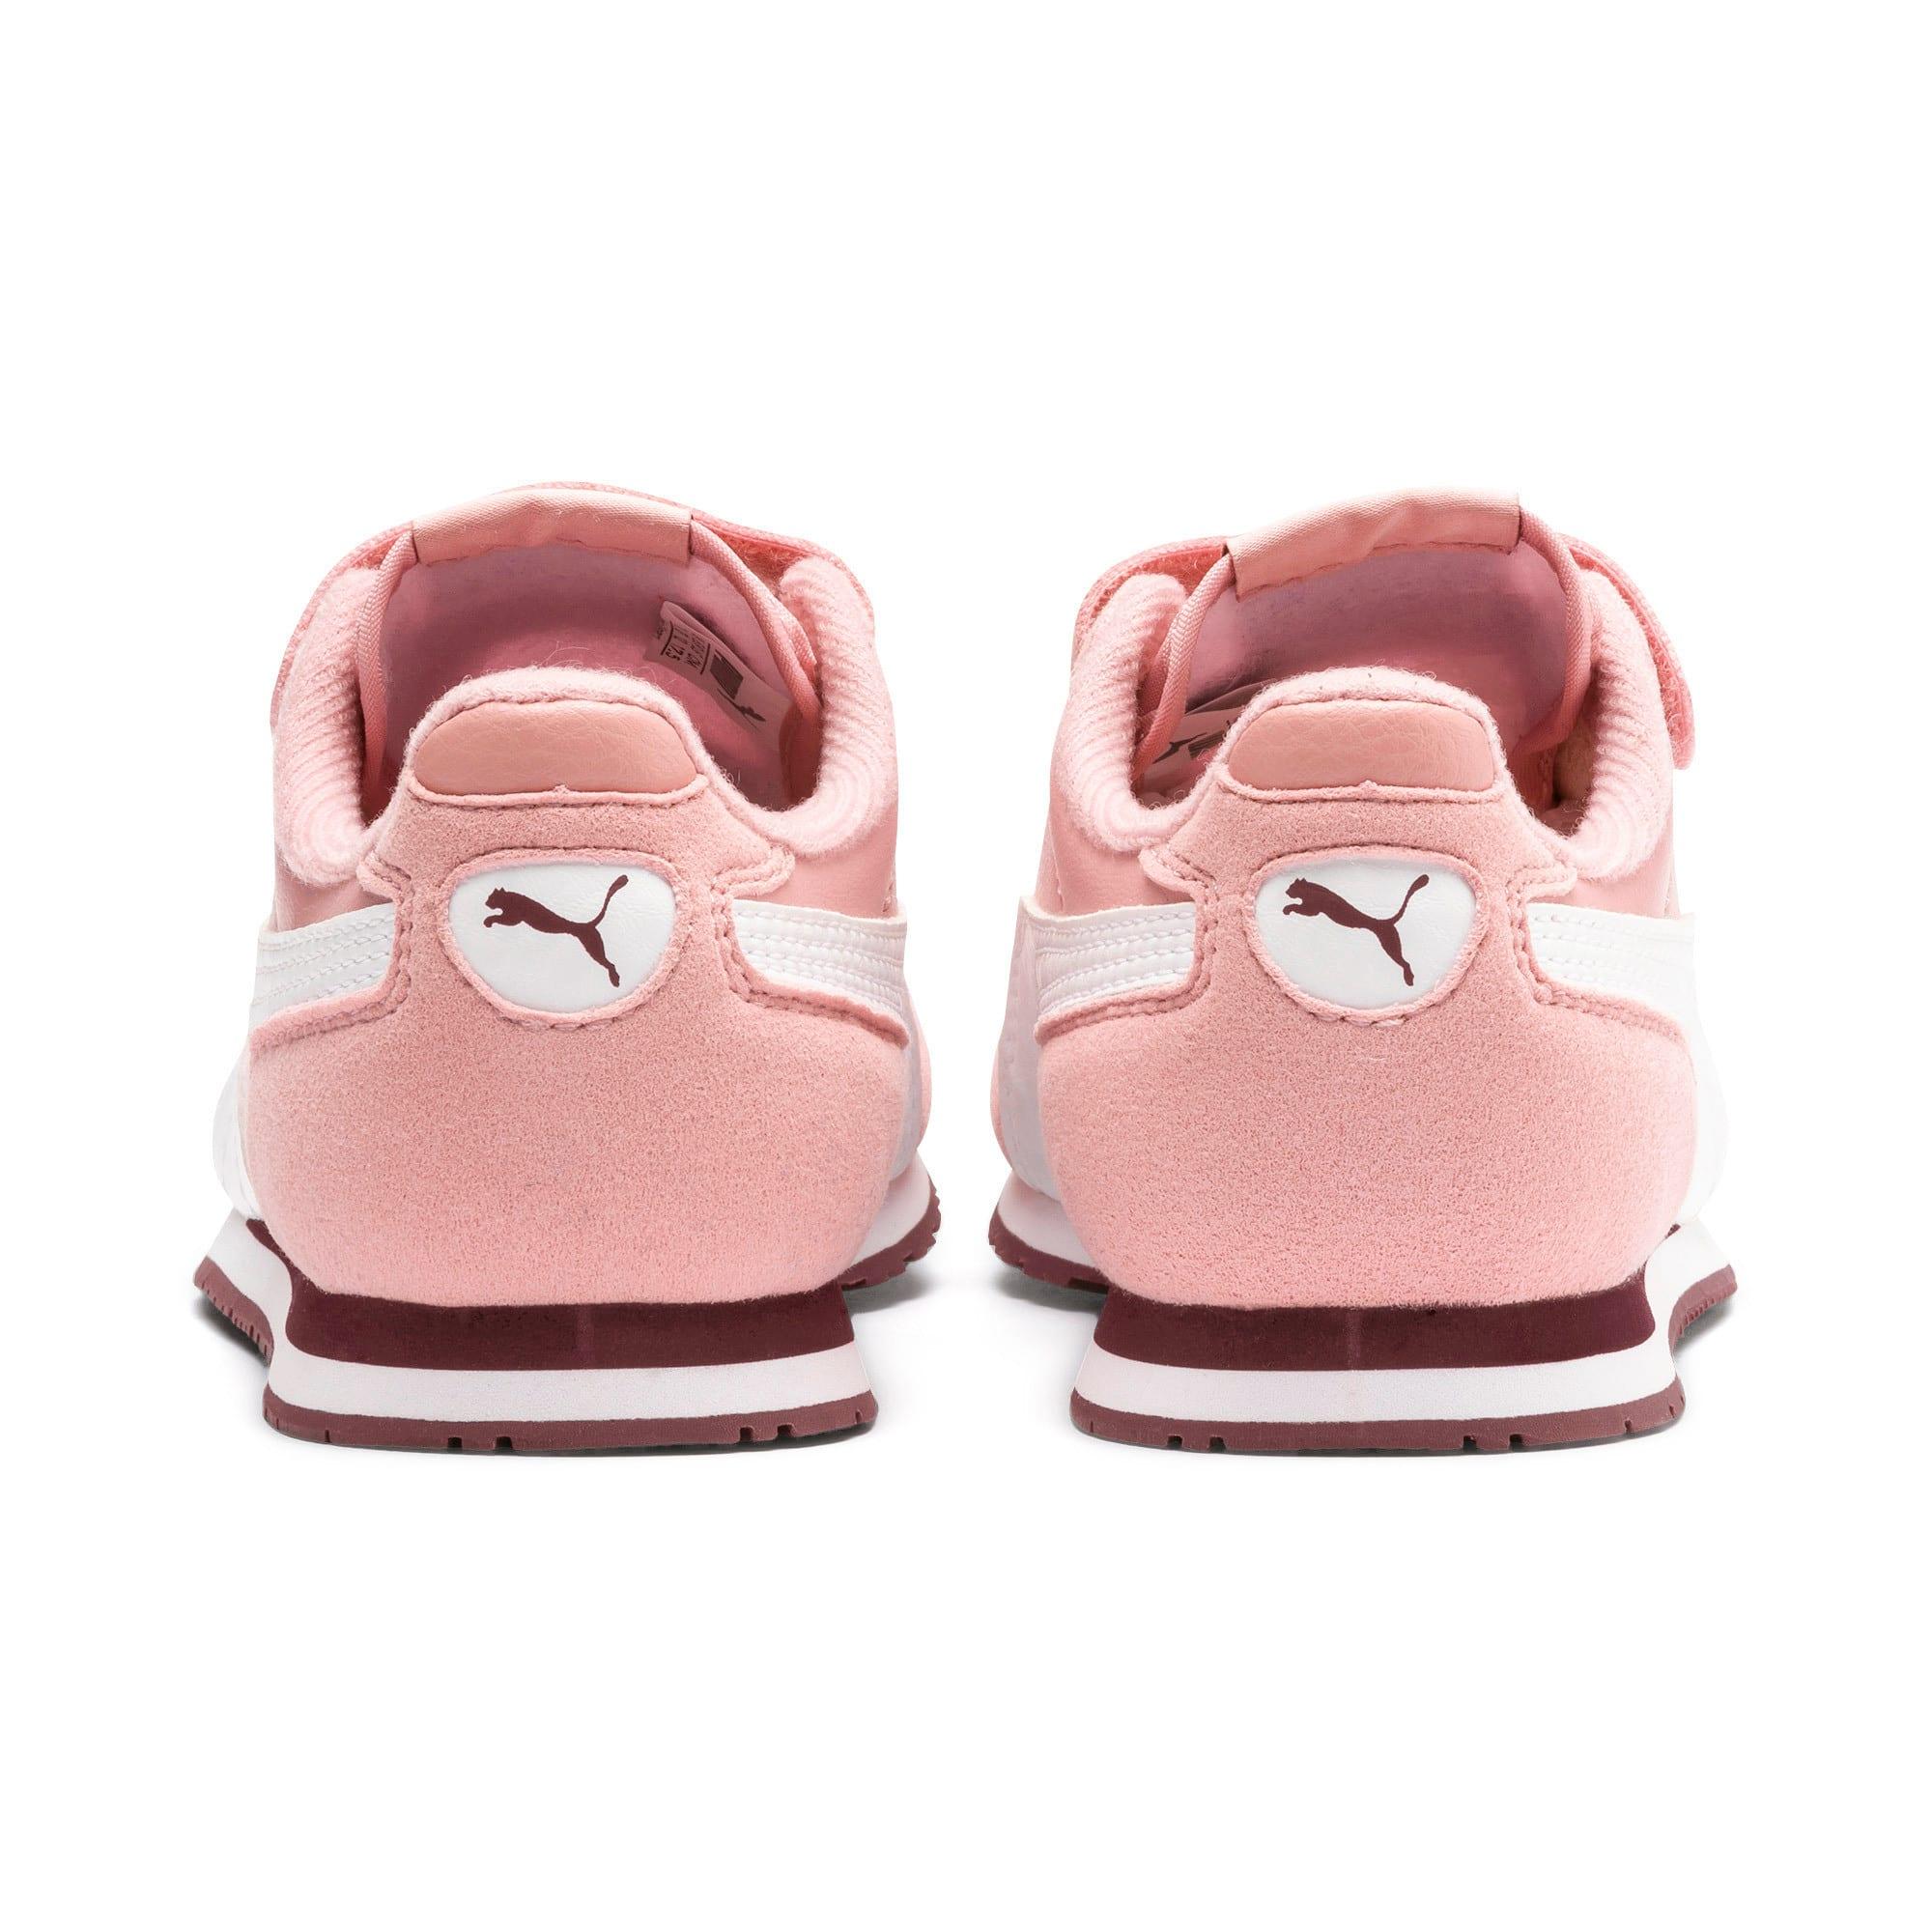 Thumbnail 3 of Cabana Racer SL V PS Baby Sneaker, Bridal Rose-Puma White, medium